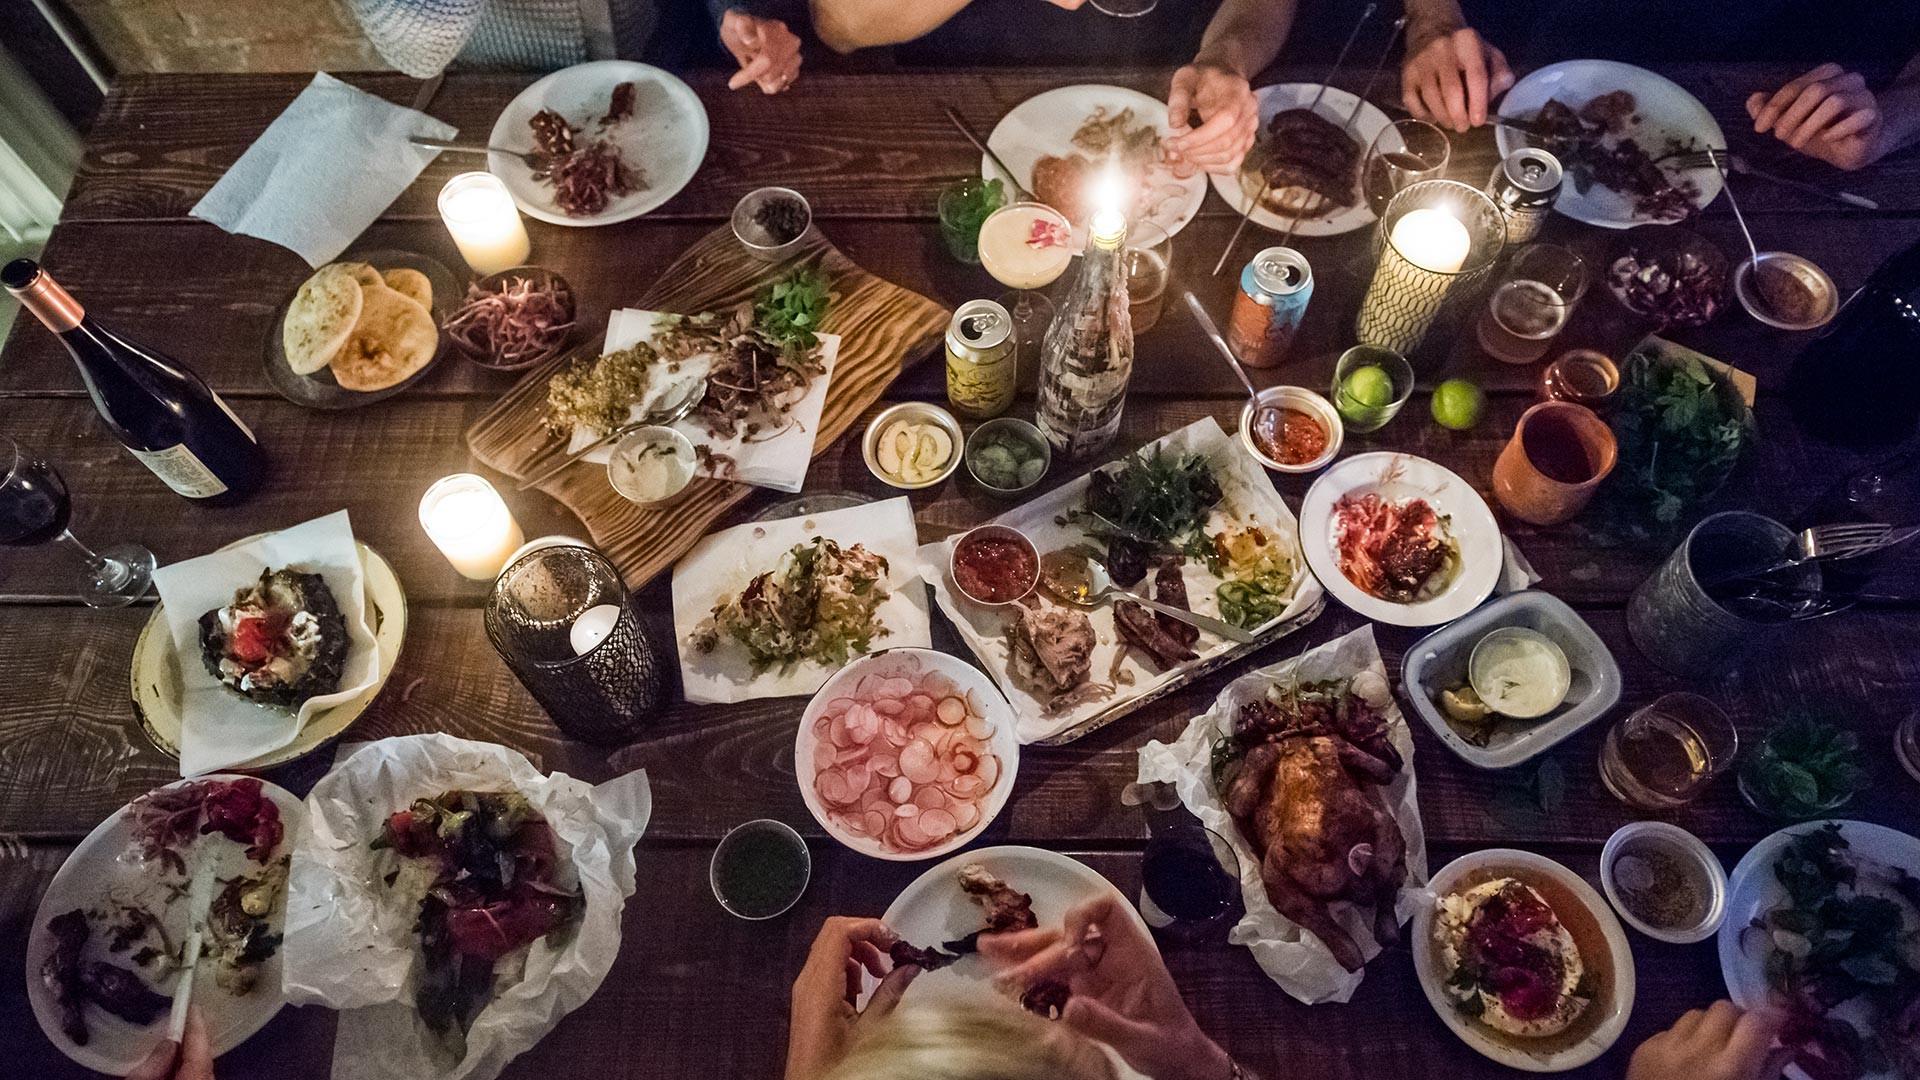 Berber & Q Christmas feast